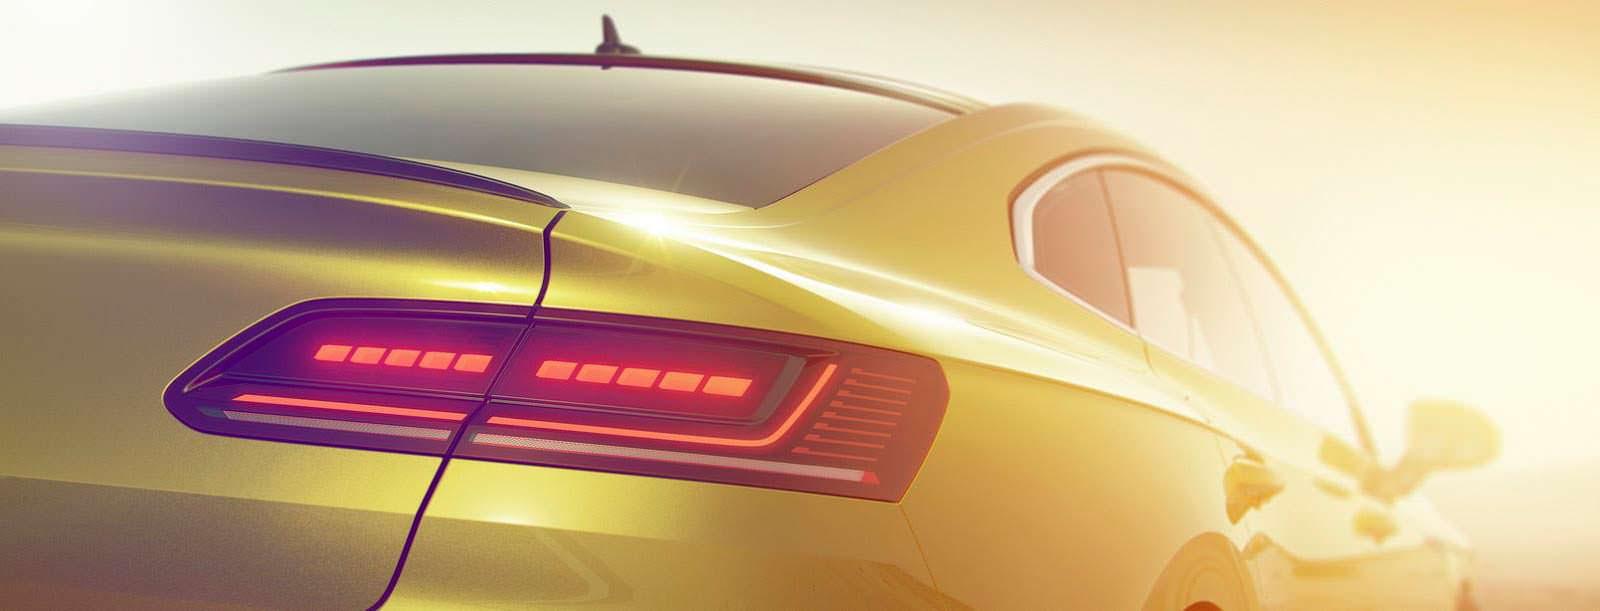 Задние фонари VW Arteon